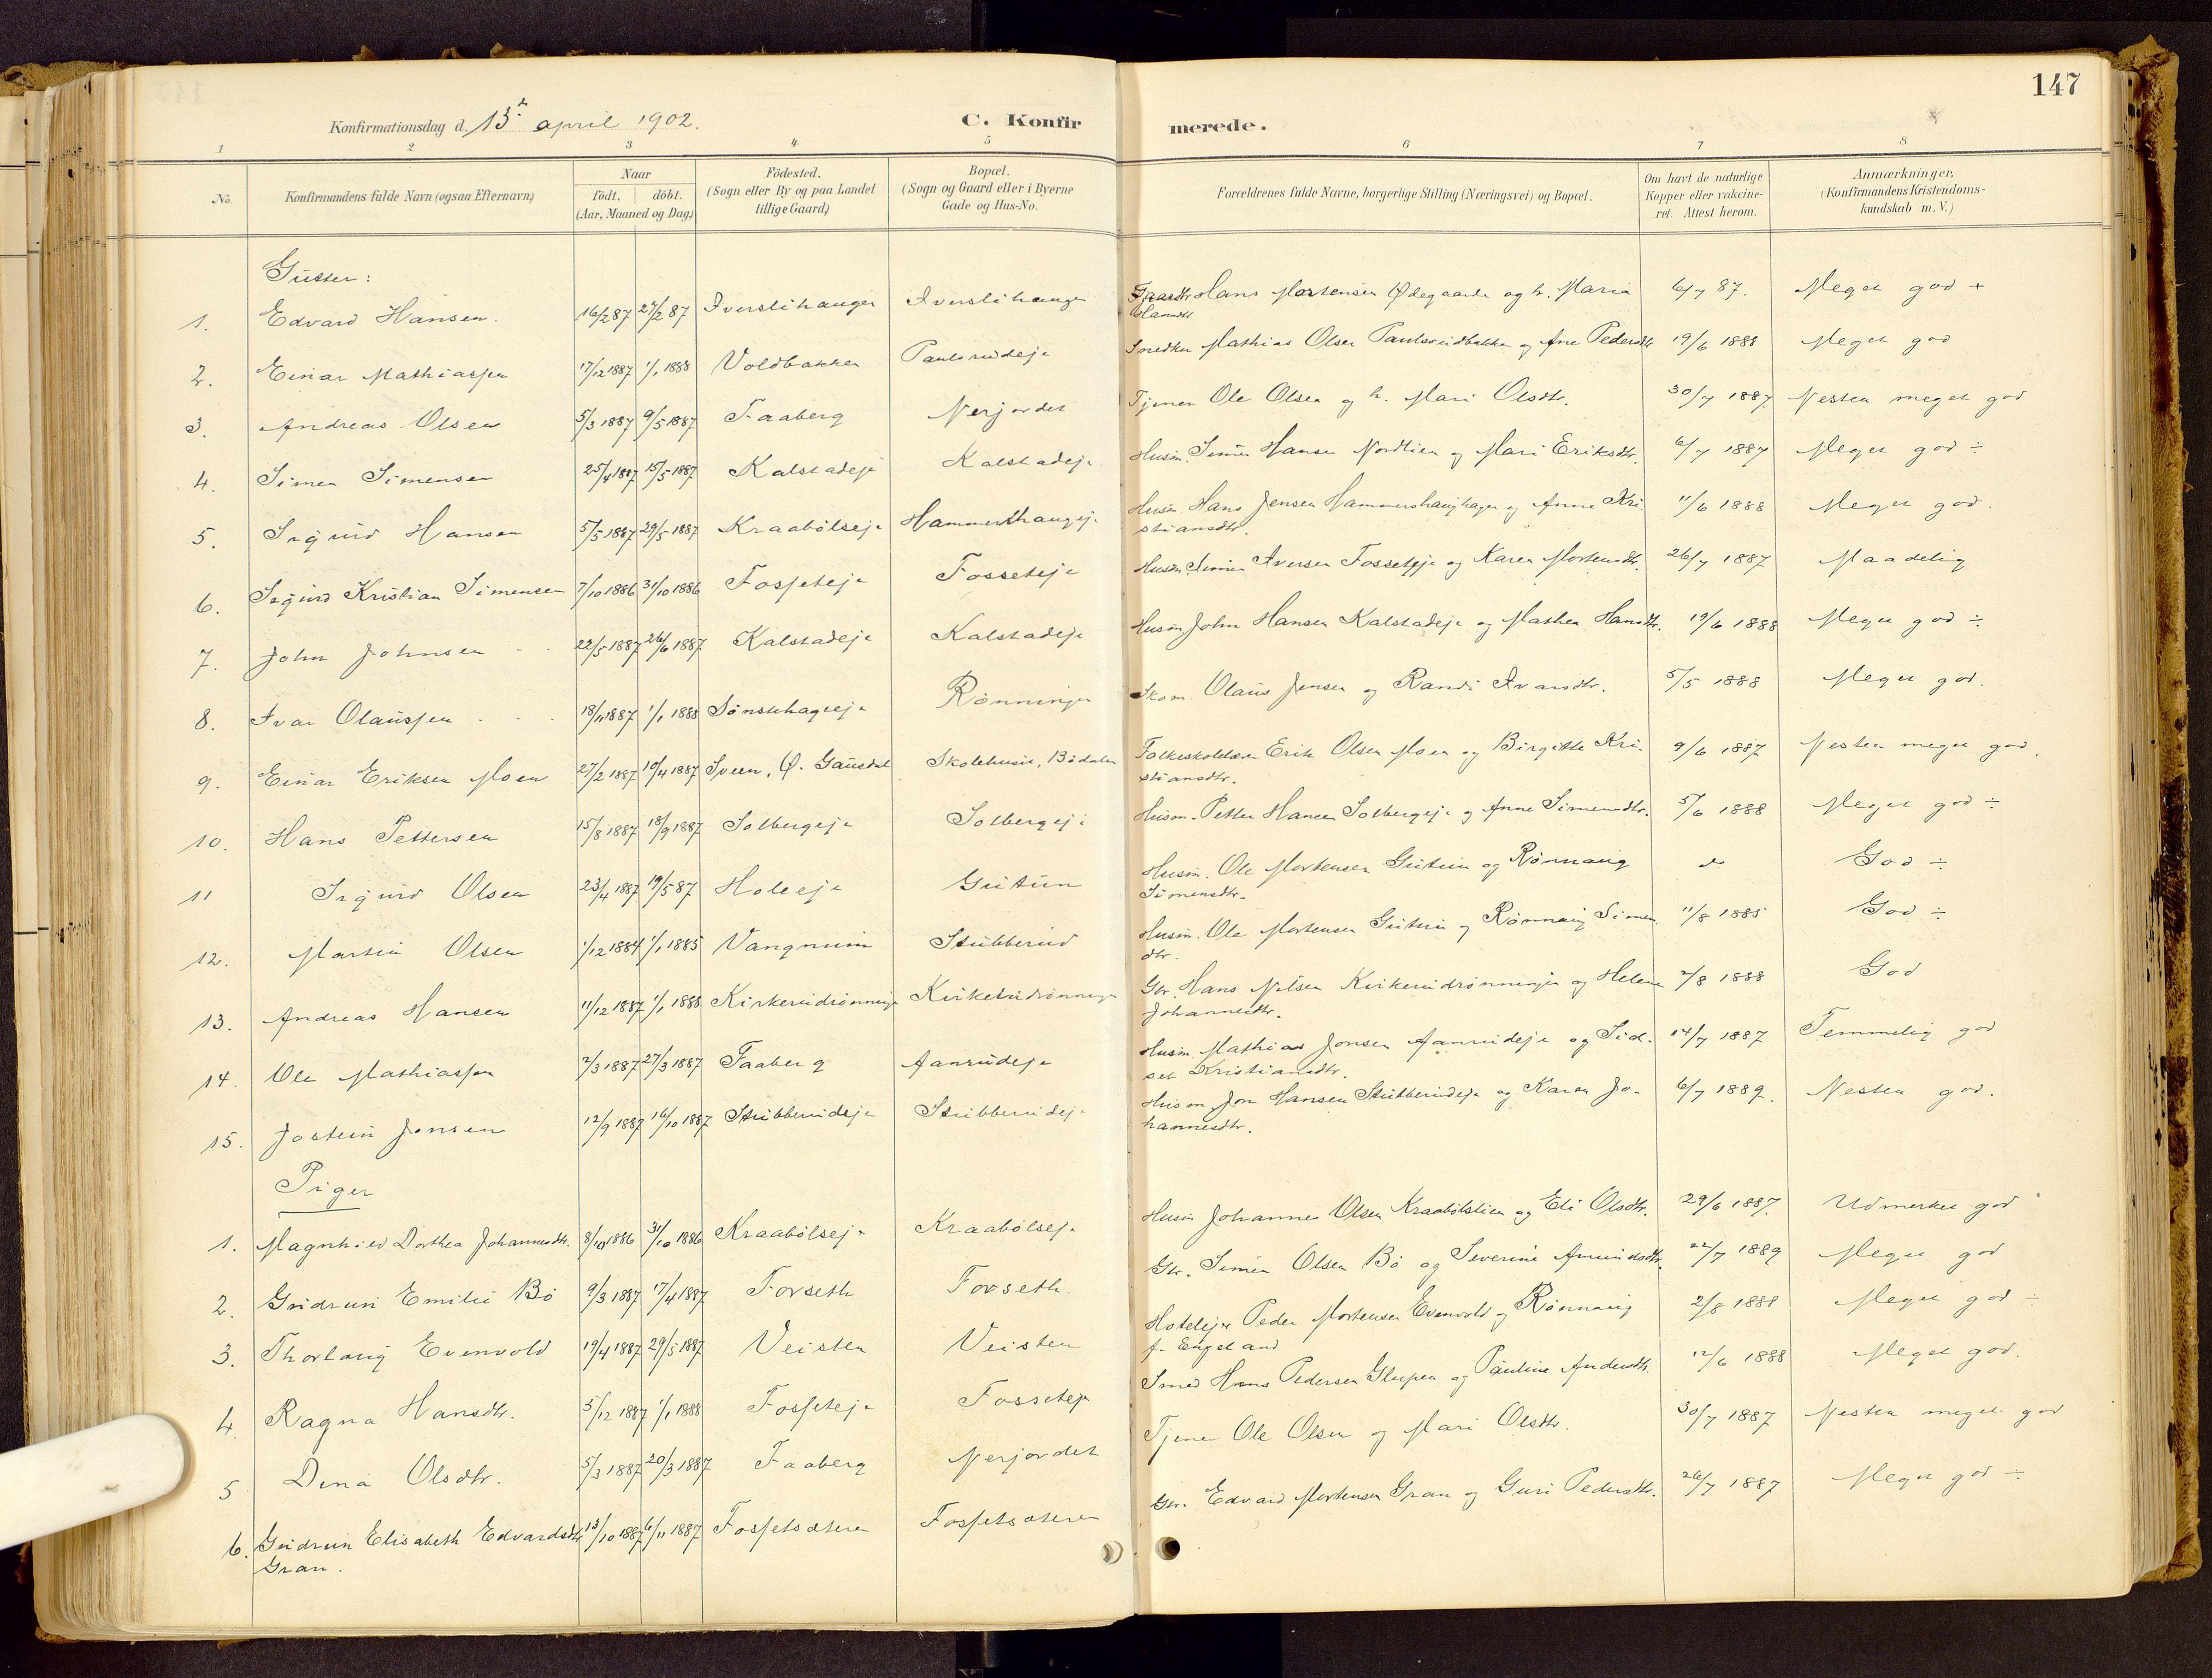 SAH, Vestre Gausdal prestekontor, Ministerialbok nr. 1, 1887-1914, s. 147